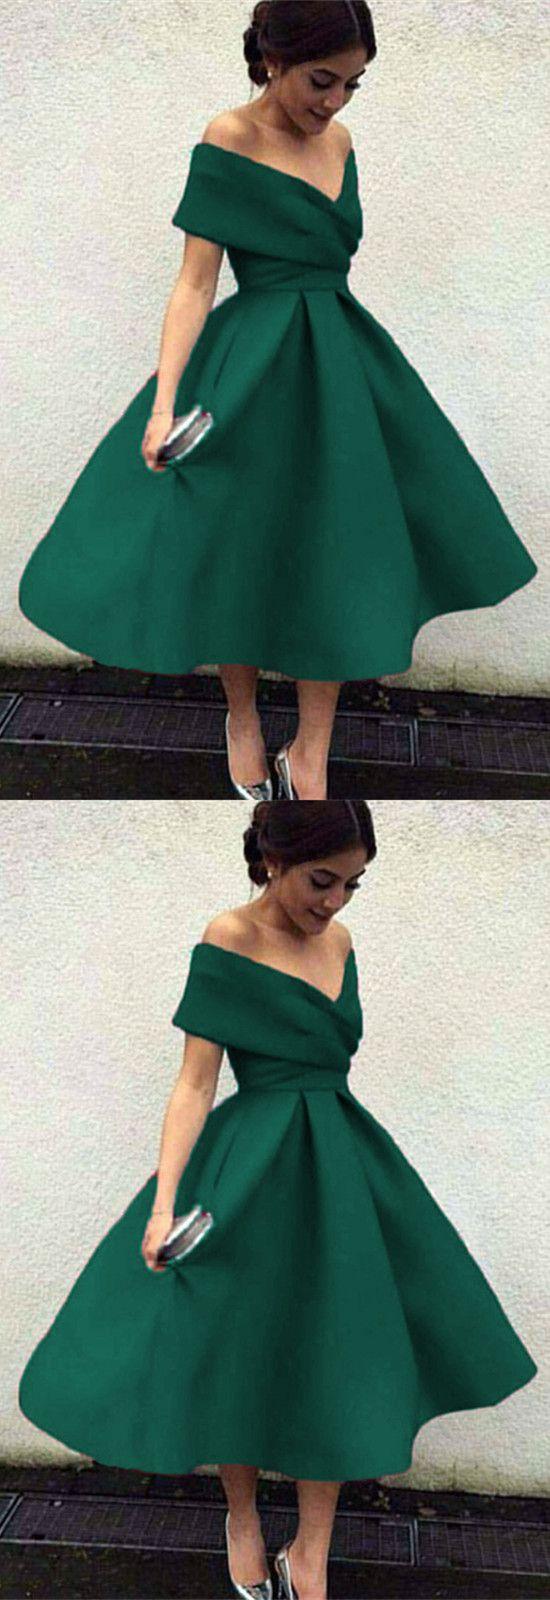 Vintage 1950s Style V Neck Off The Shoulder Tea Length Ball Gowns Party Dresses Tea Length Bridesmaid Dresses Green Prom Dress Prom Dresses With Pockets [ 1600 x 550 Pixel ]